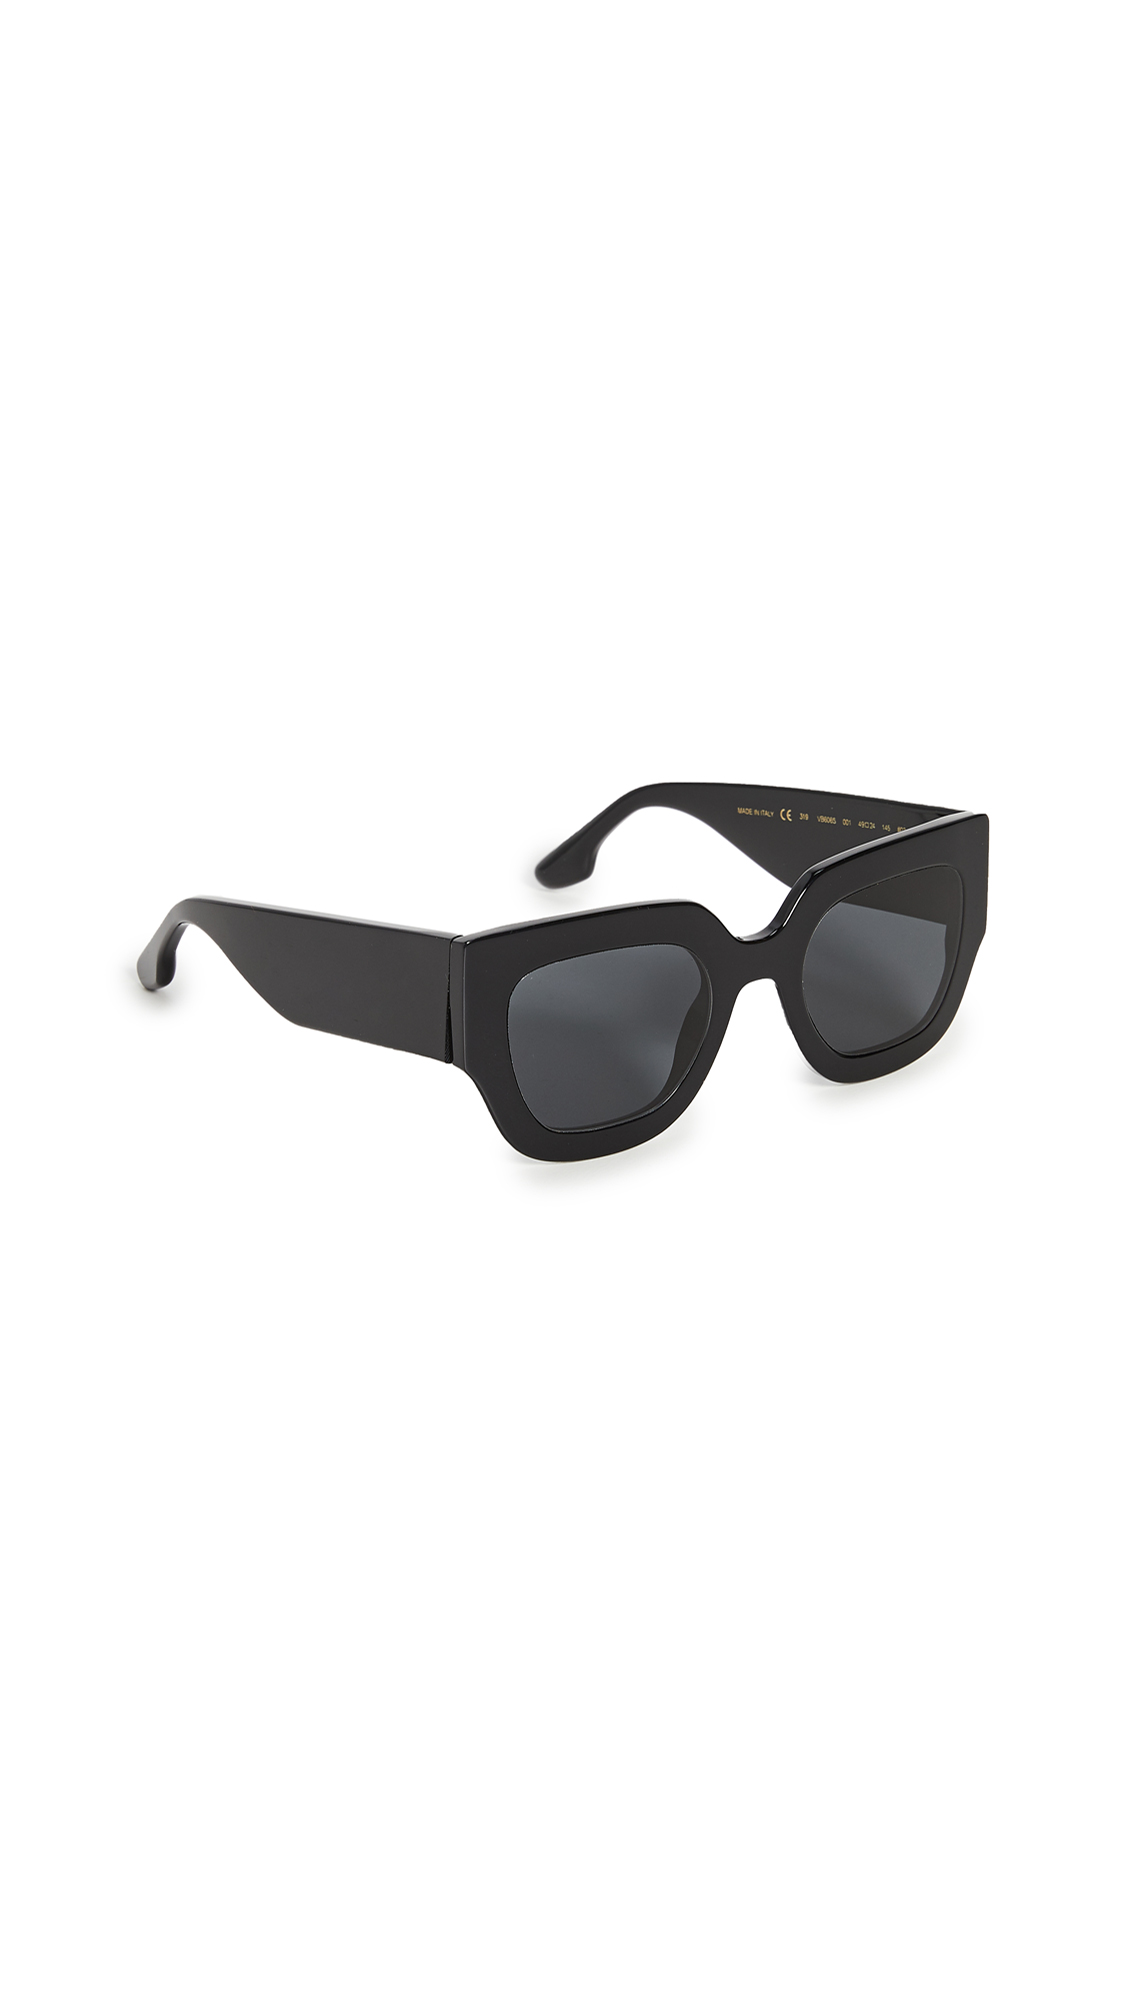 Victoria Beckham Sunglasses CLASSIC LOGO SUNGLASSES